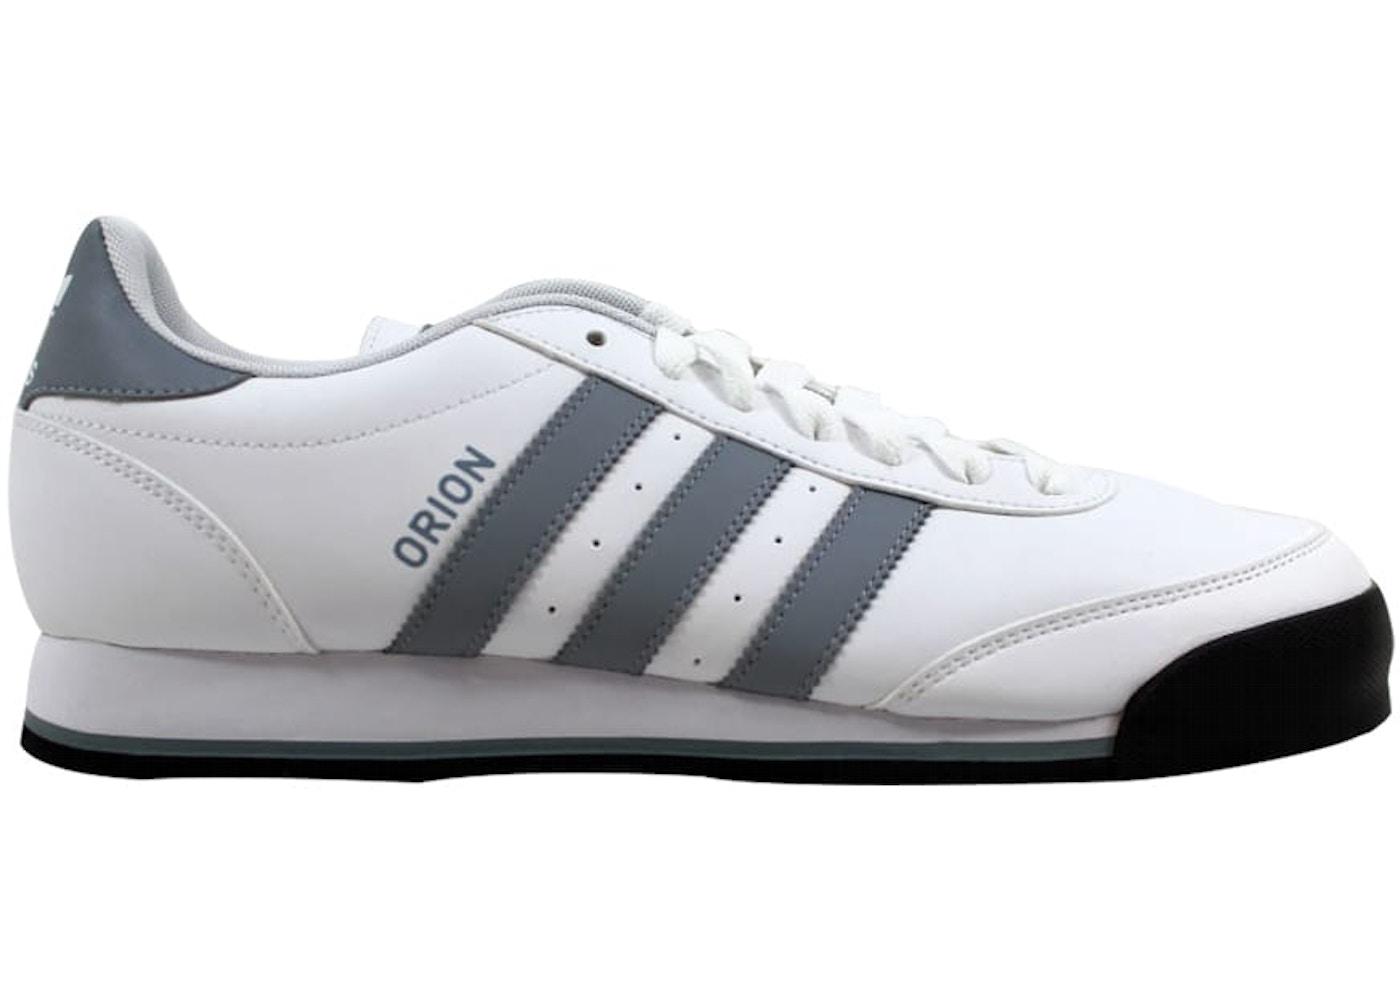 wholesale dealer 49e87 66ac2 adidas Orion 2 White Silver-Black